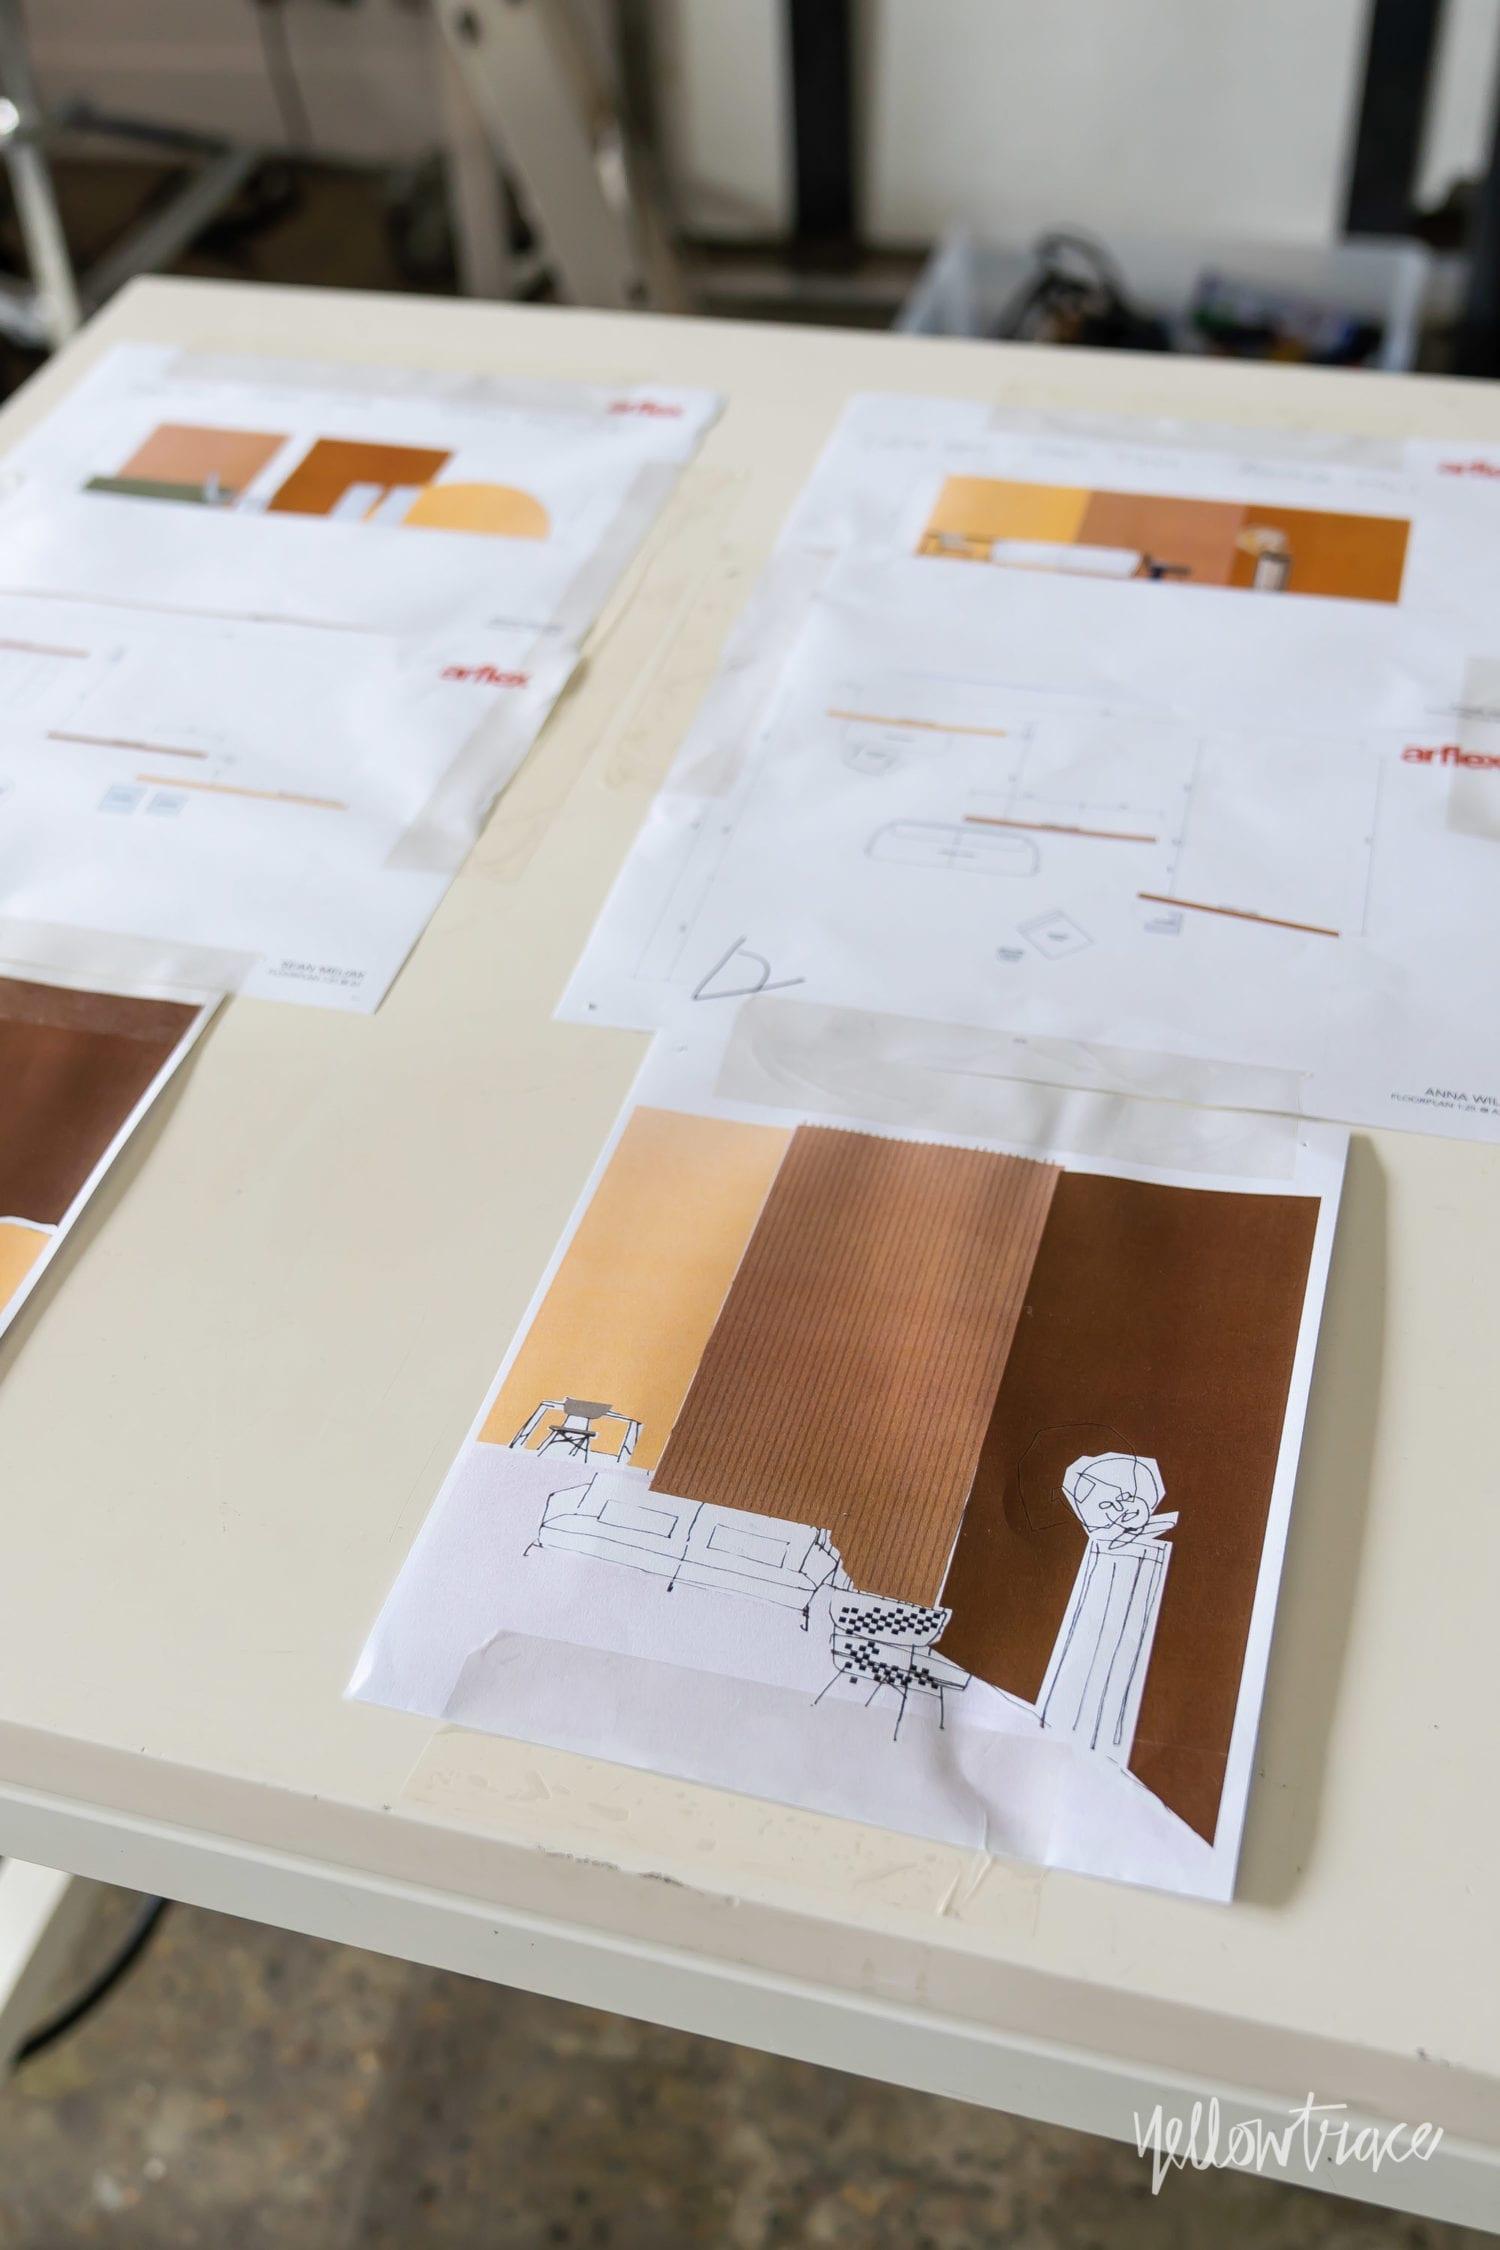 Yellowtrace X Arflex Art – Design – Arflex Campaign BTS. Photo by Nick Hughes | Yellowtrace